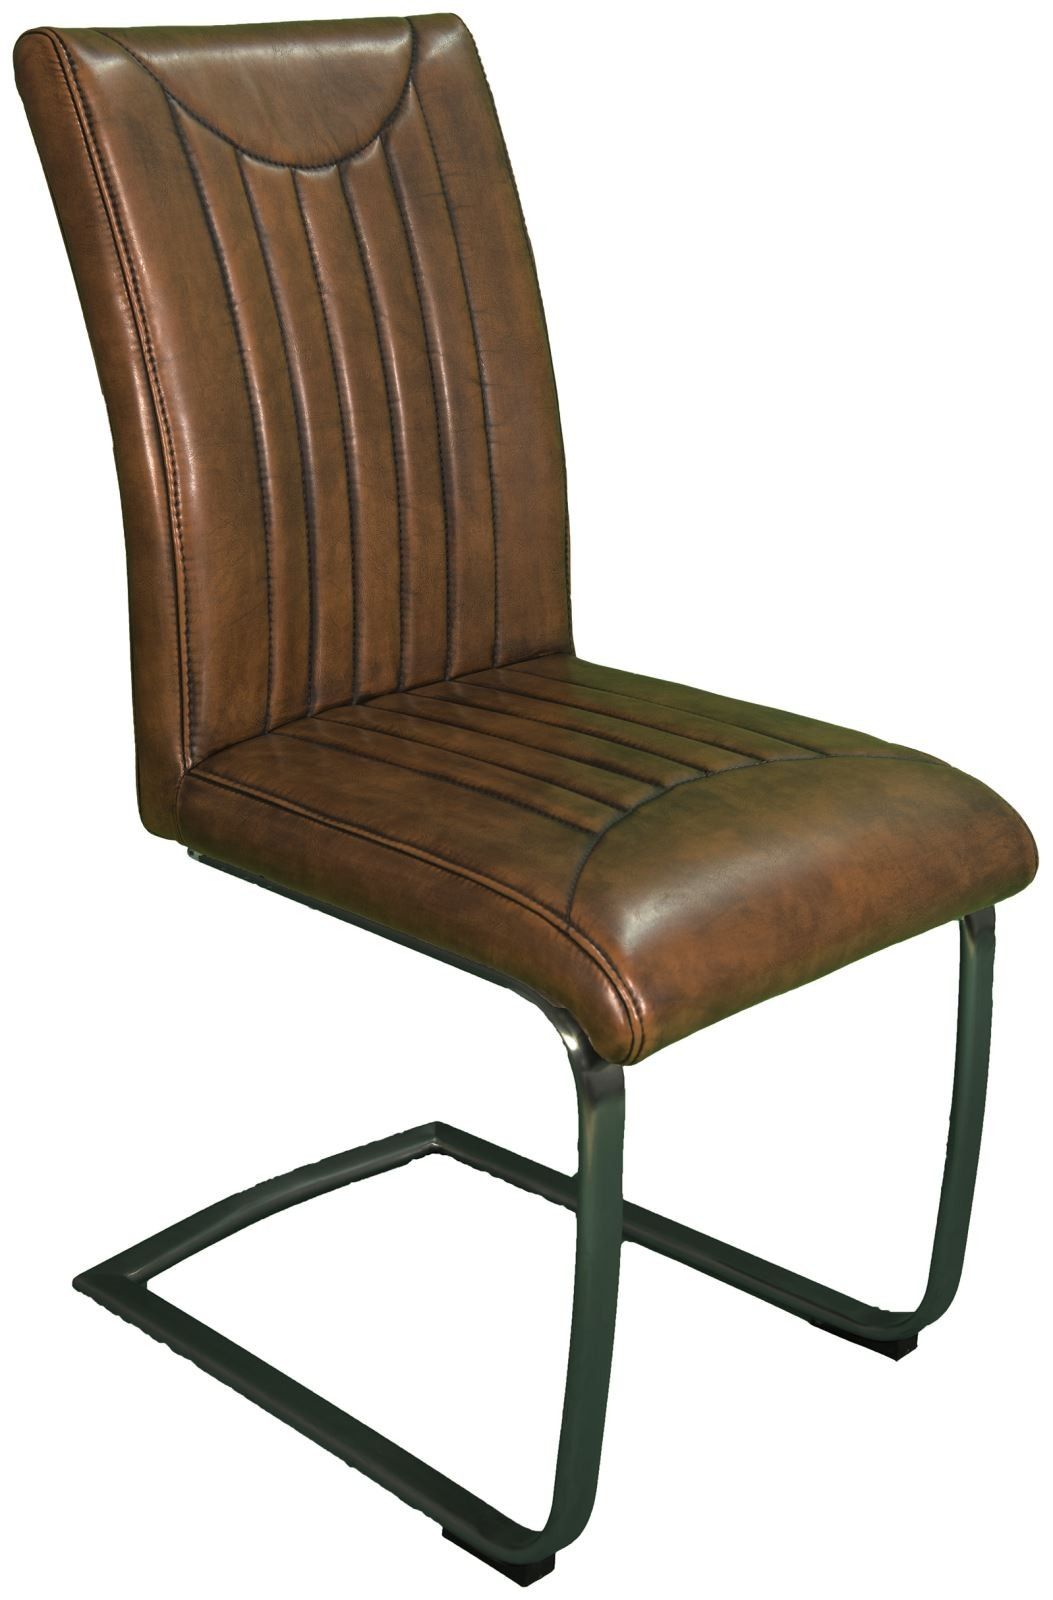 Heirloom Industrial Dining Chair - Retro Stitch Vintage Frame